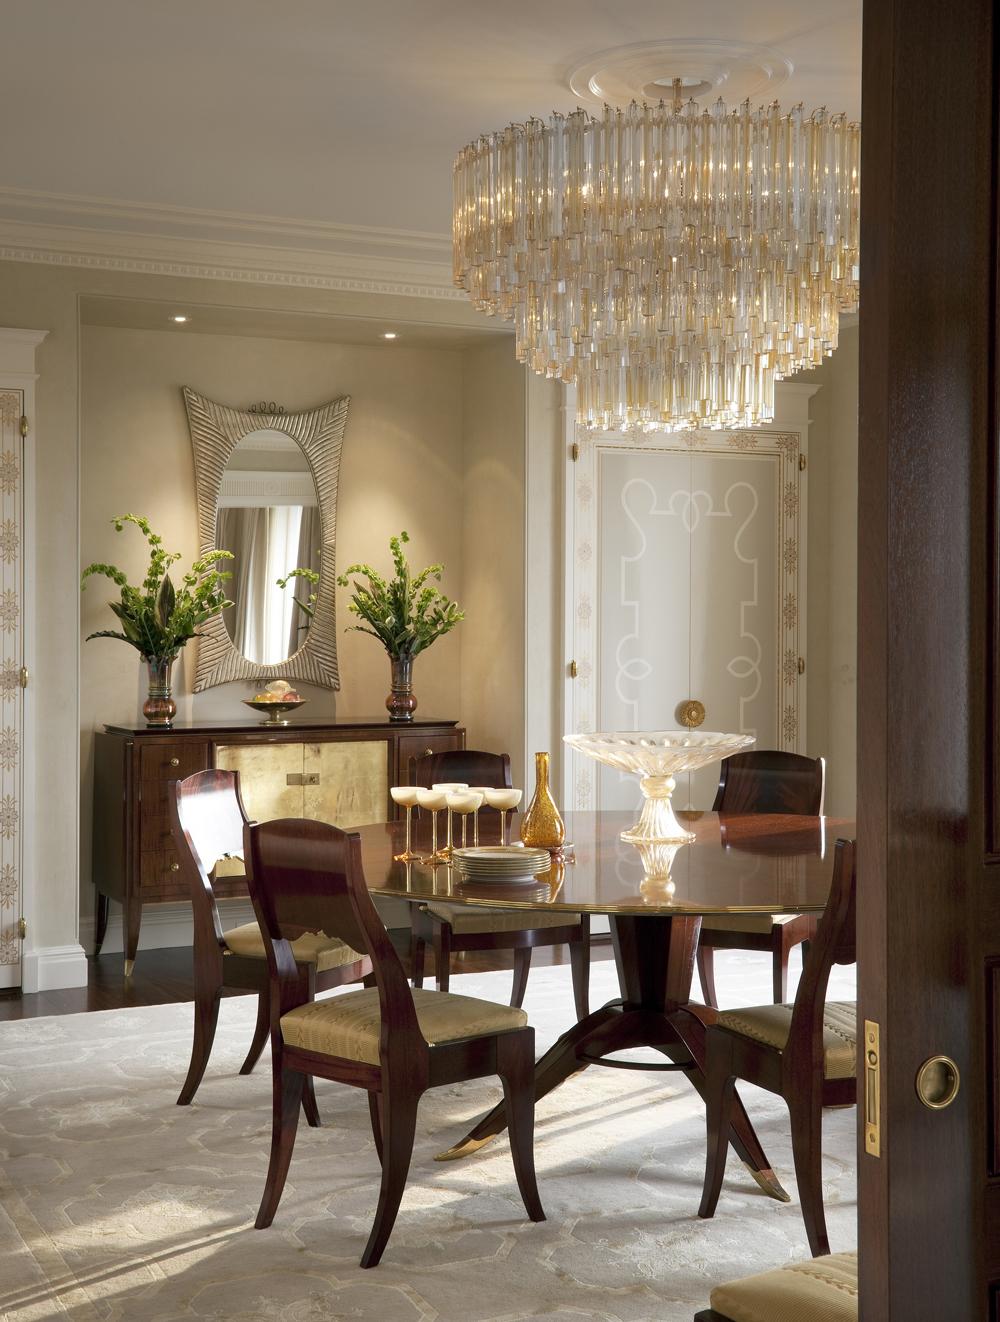 LSI-web-fifth-ave-interior-dining-room-4A.jpg